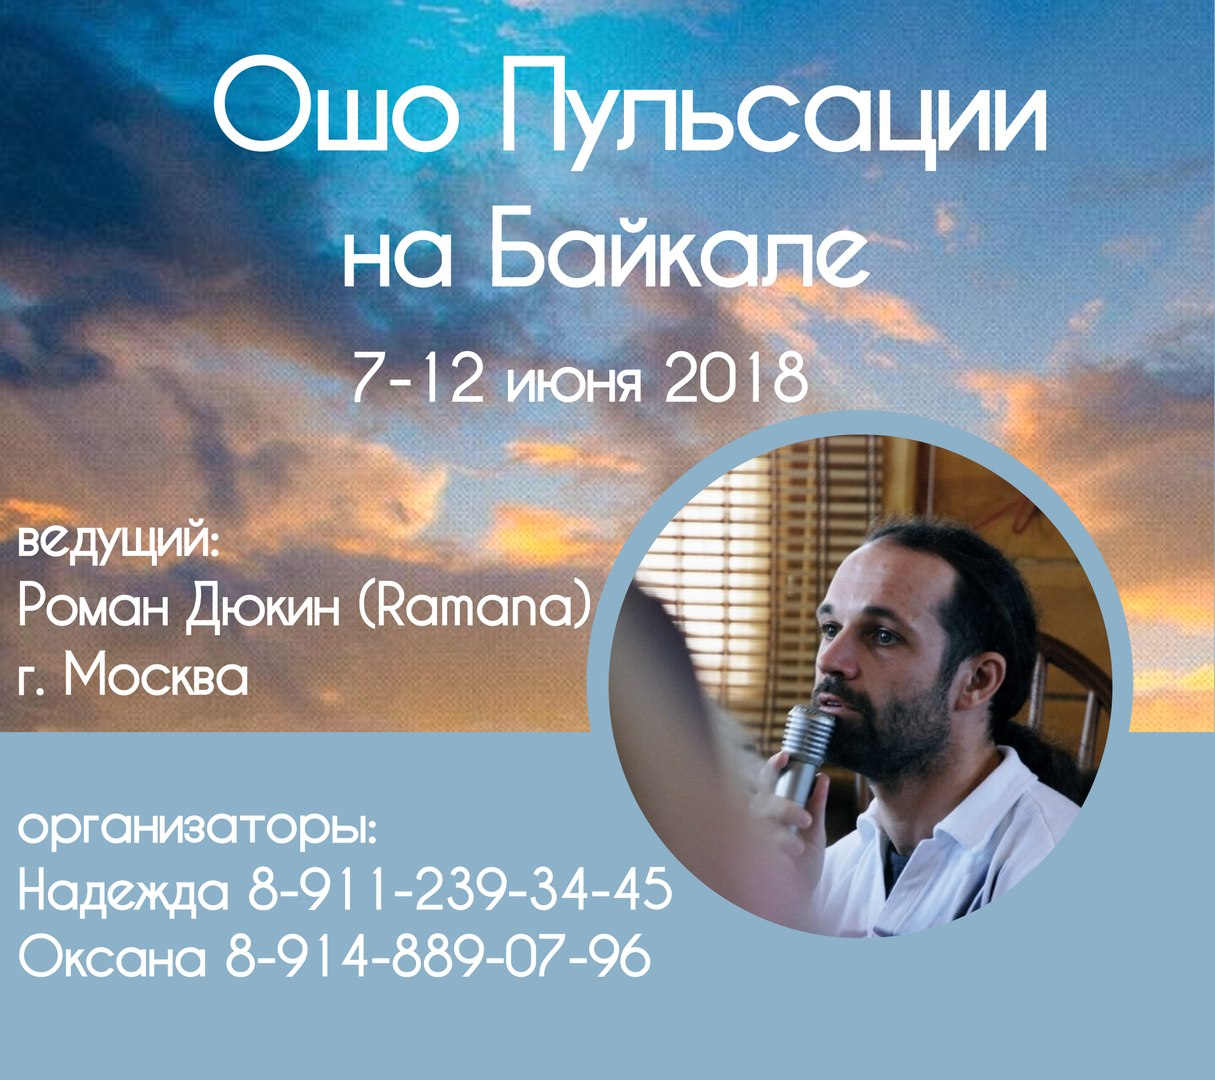 Афиша Иркутск Ошо Пульсации на Байкале! 14-21 июня 2019.